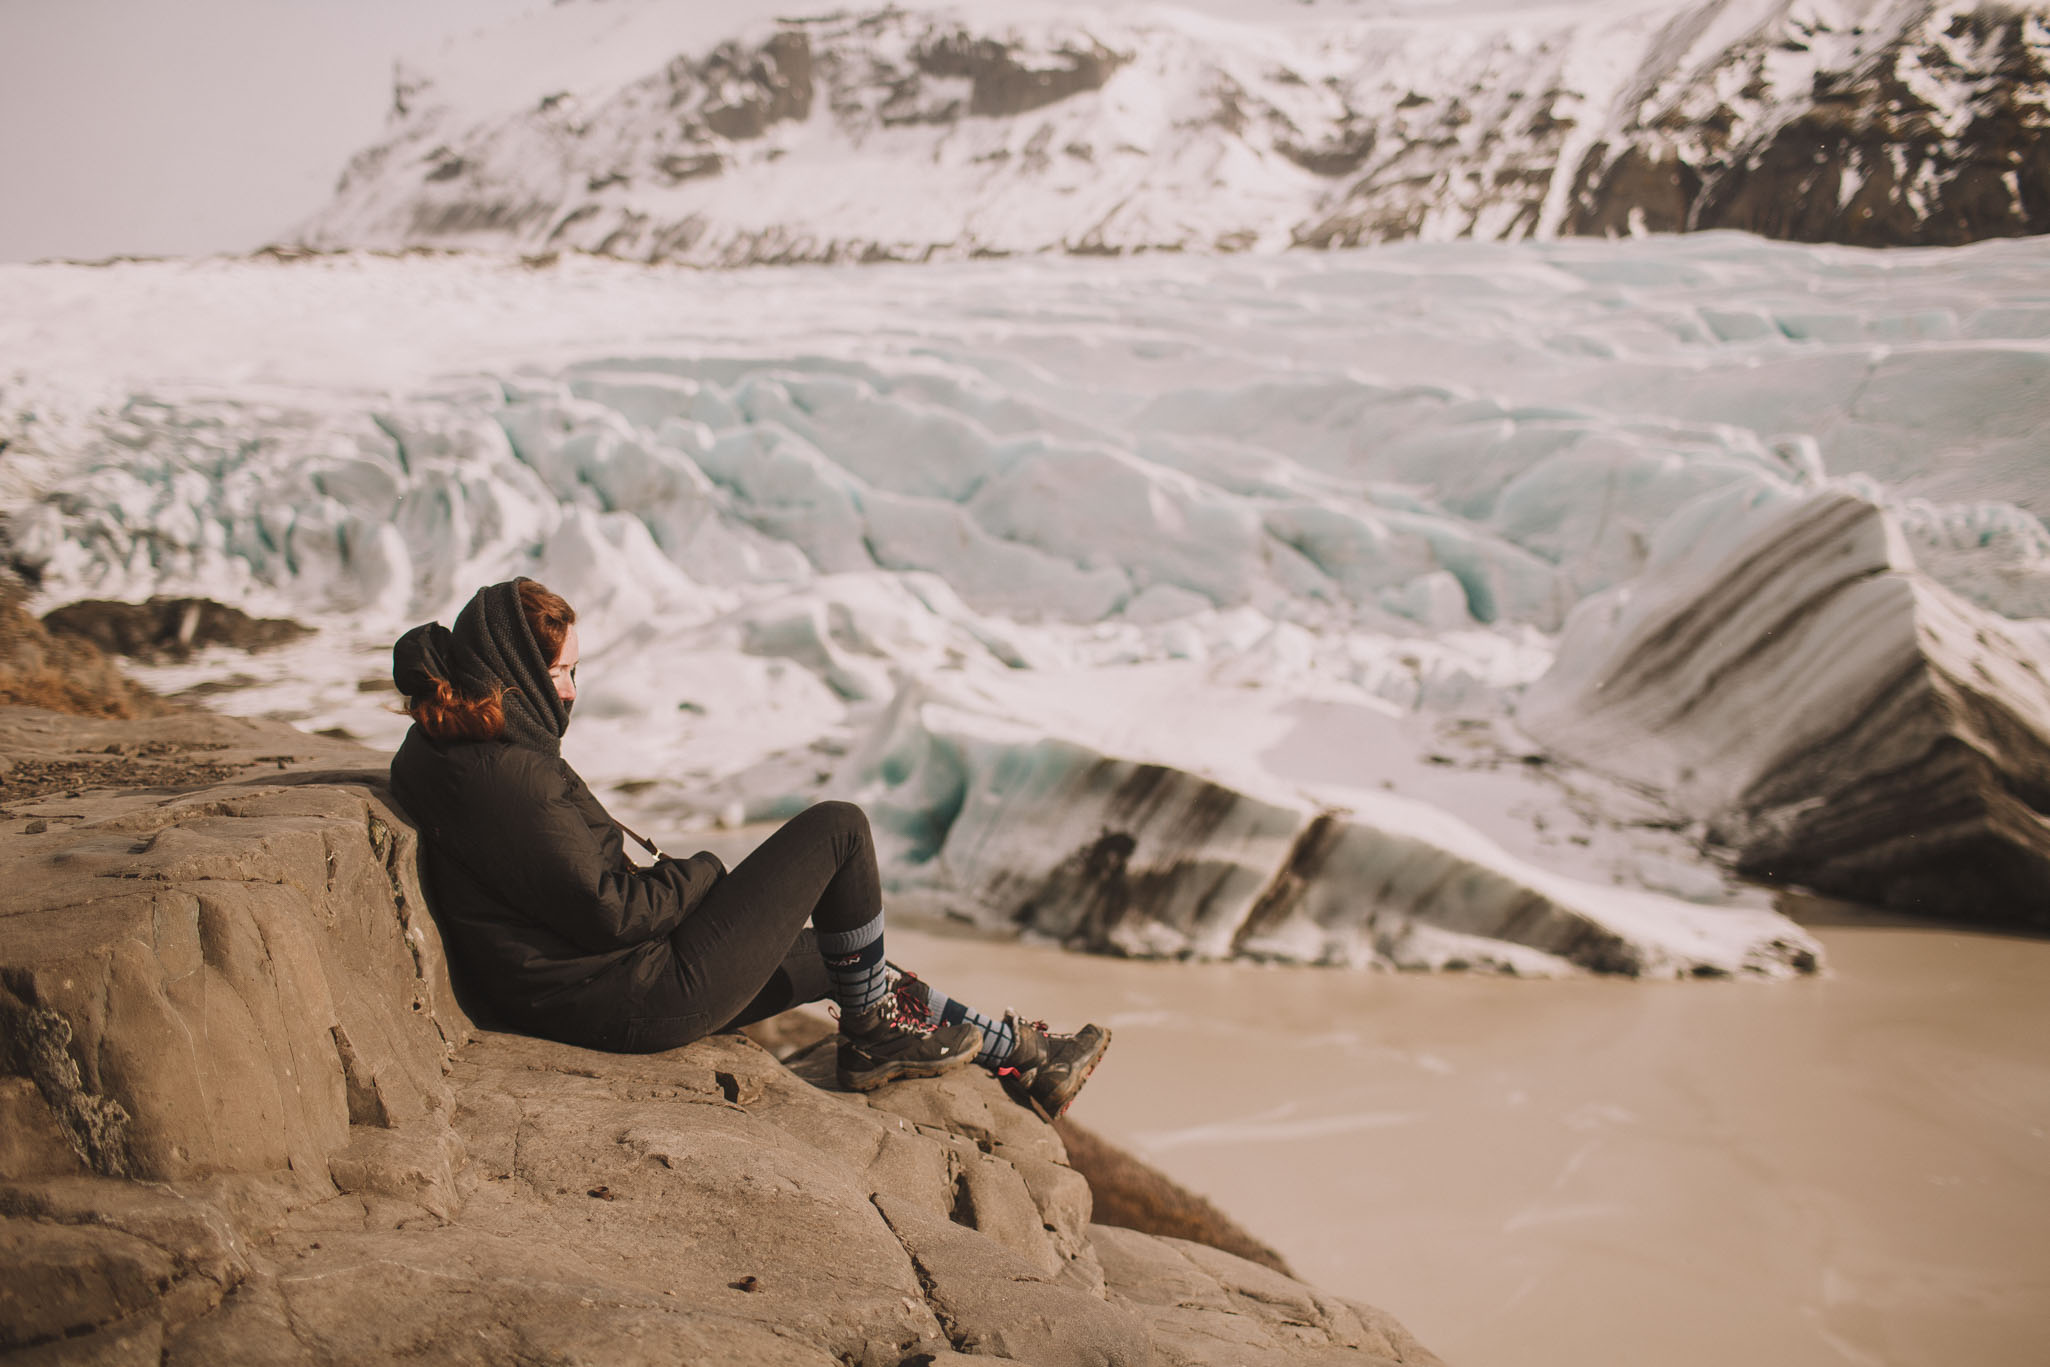 Road-trip-Islande-Iceland-Voyage-Travel-Portrait-Jérémy-Boyer-Skaftafellsjokull-5.jpg